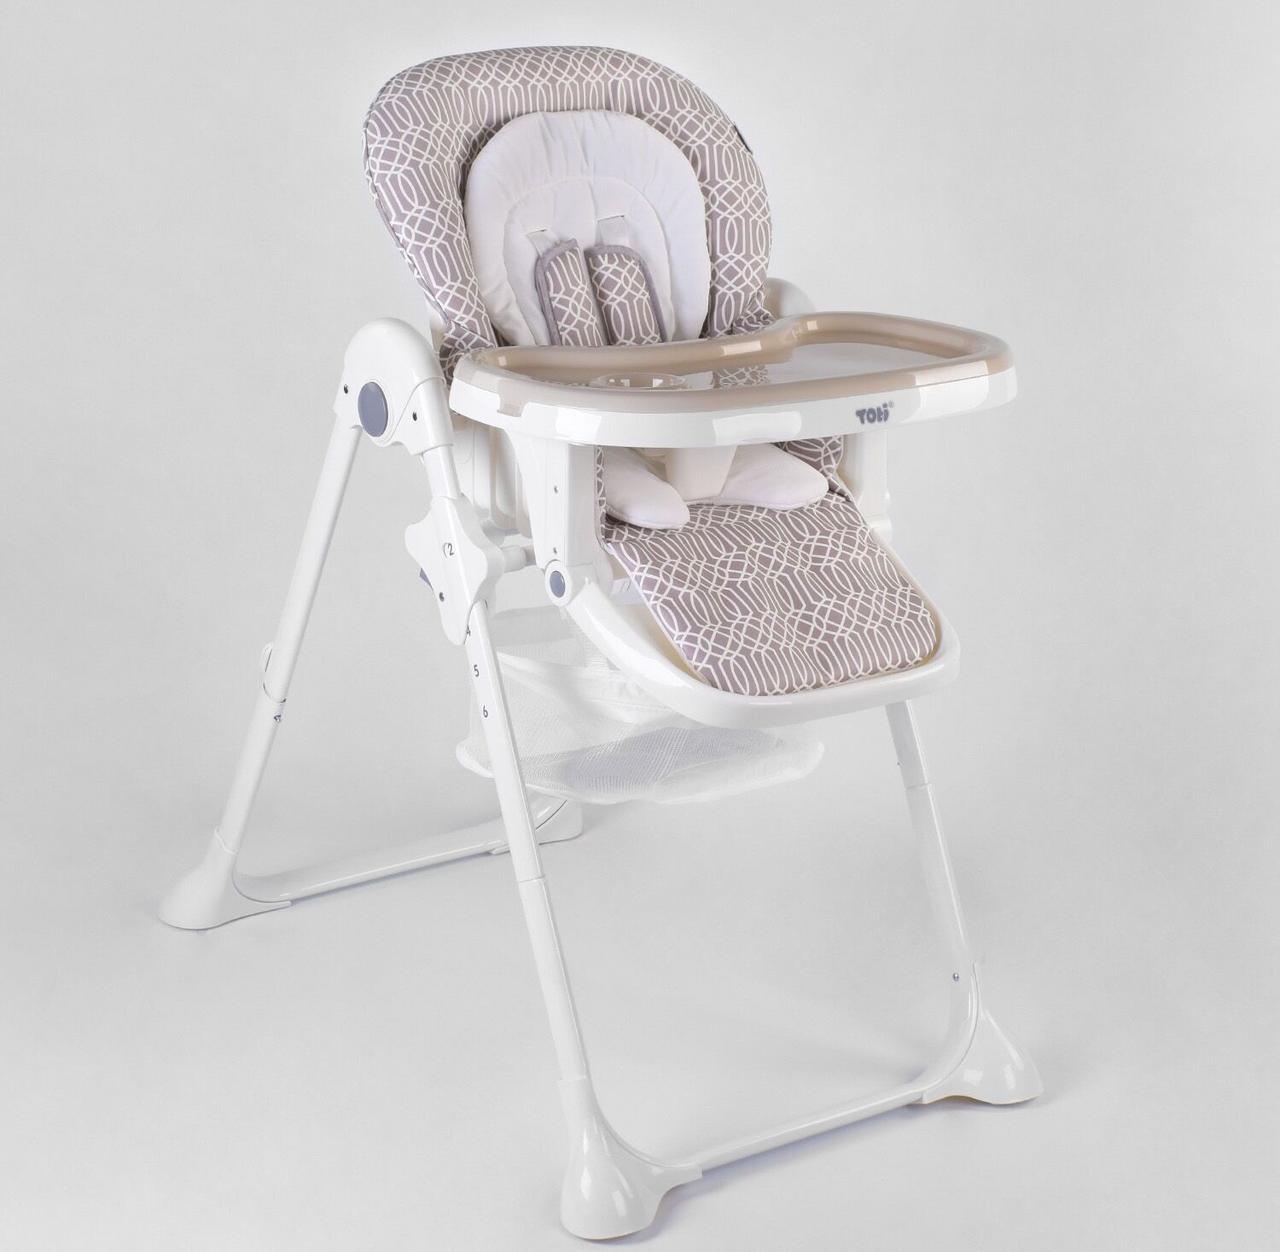 Детский стульчик для кормления Toti W-77505